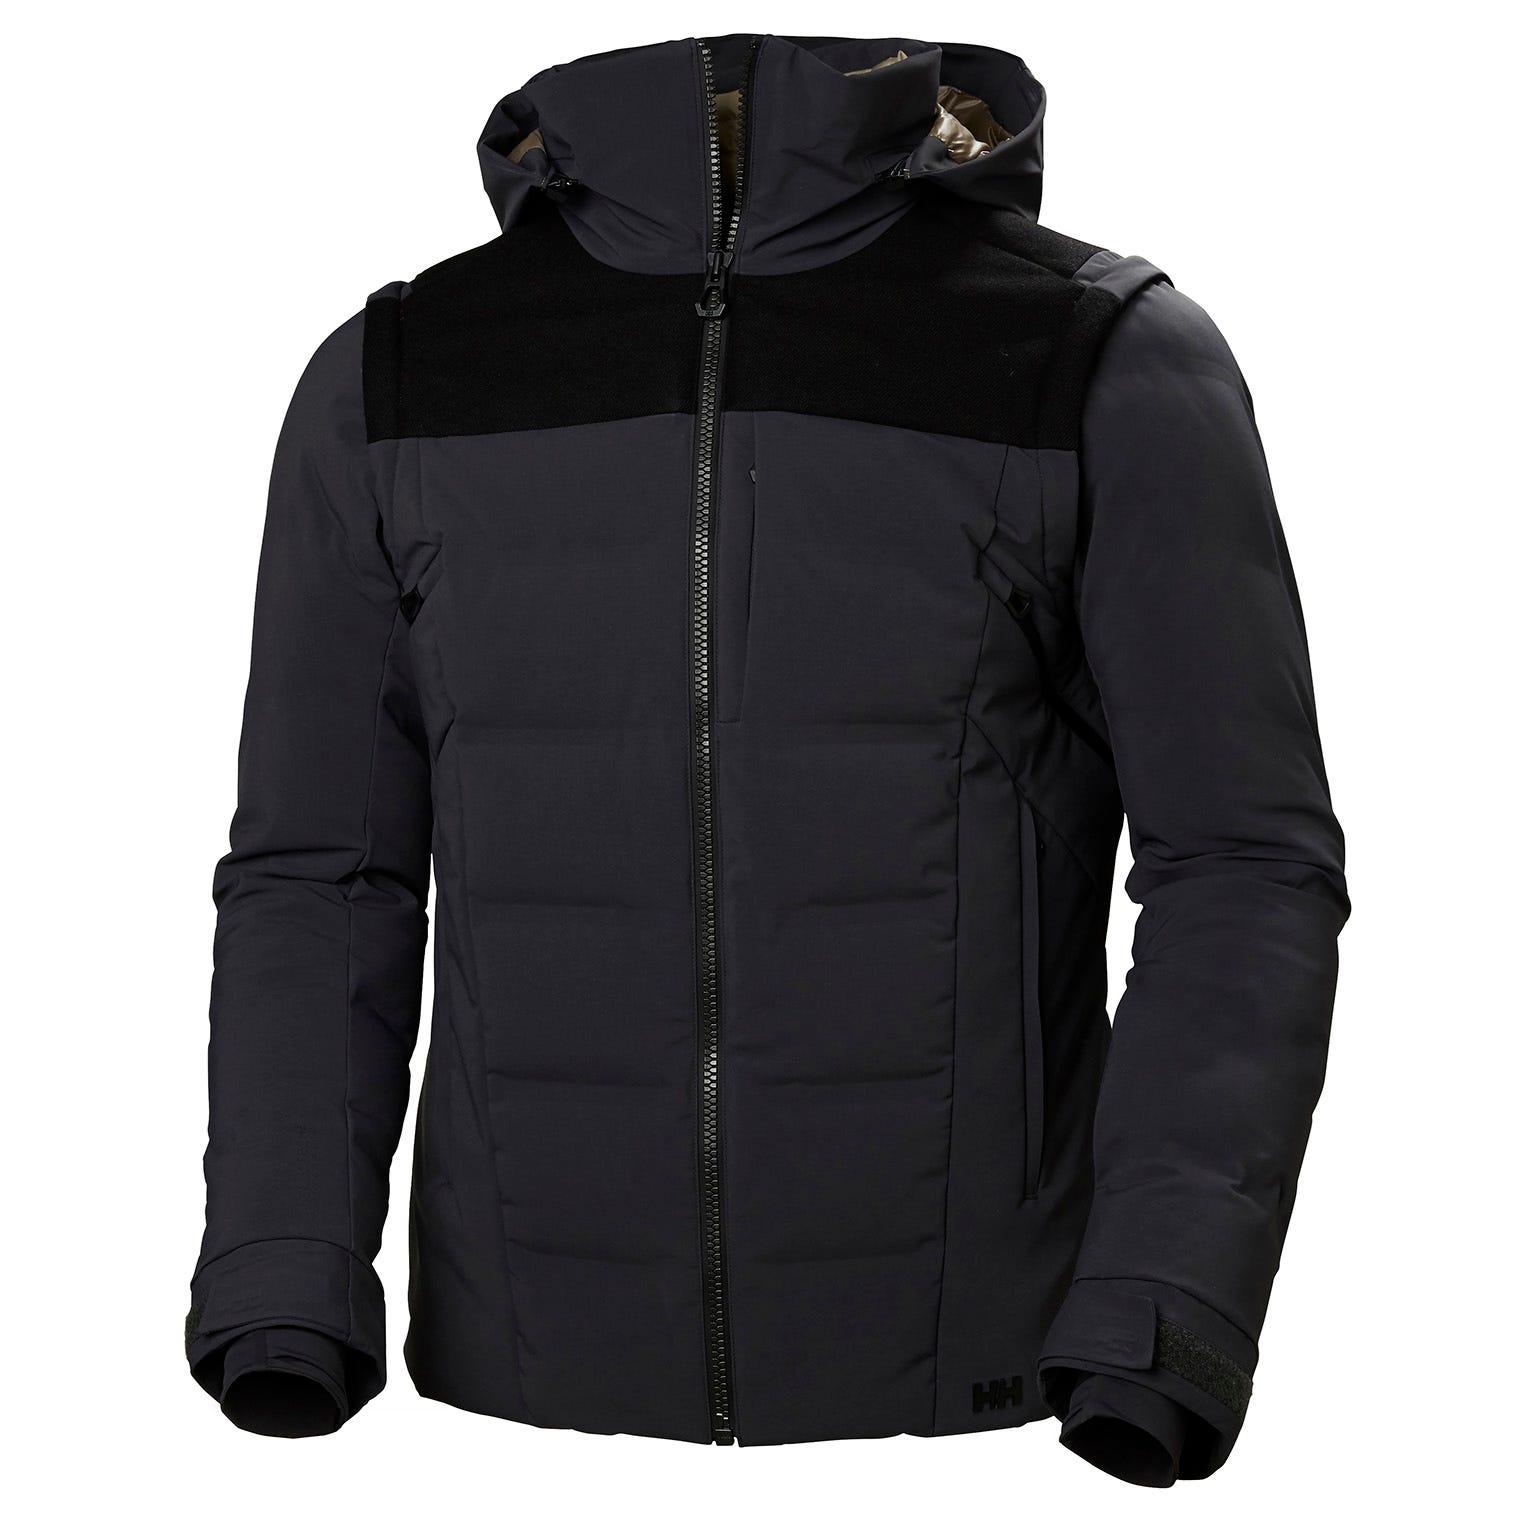 Helly Hansen Mens Kitzbühel Puffy Jacket Black XL